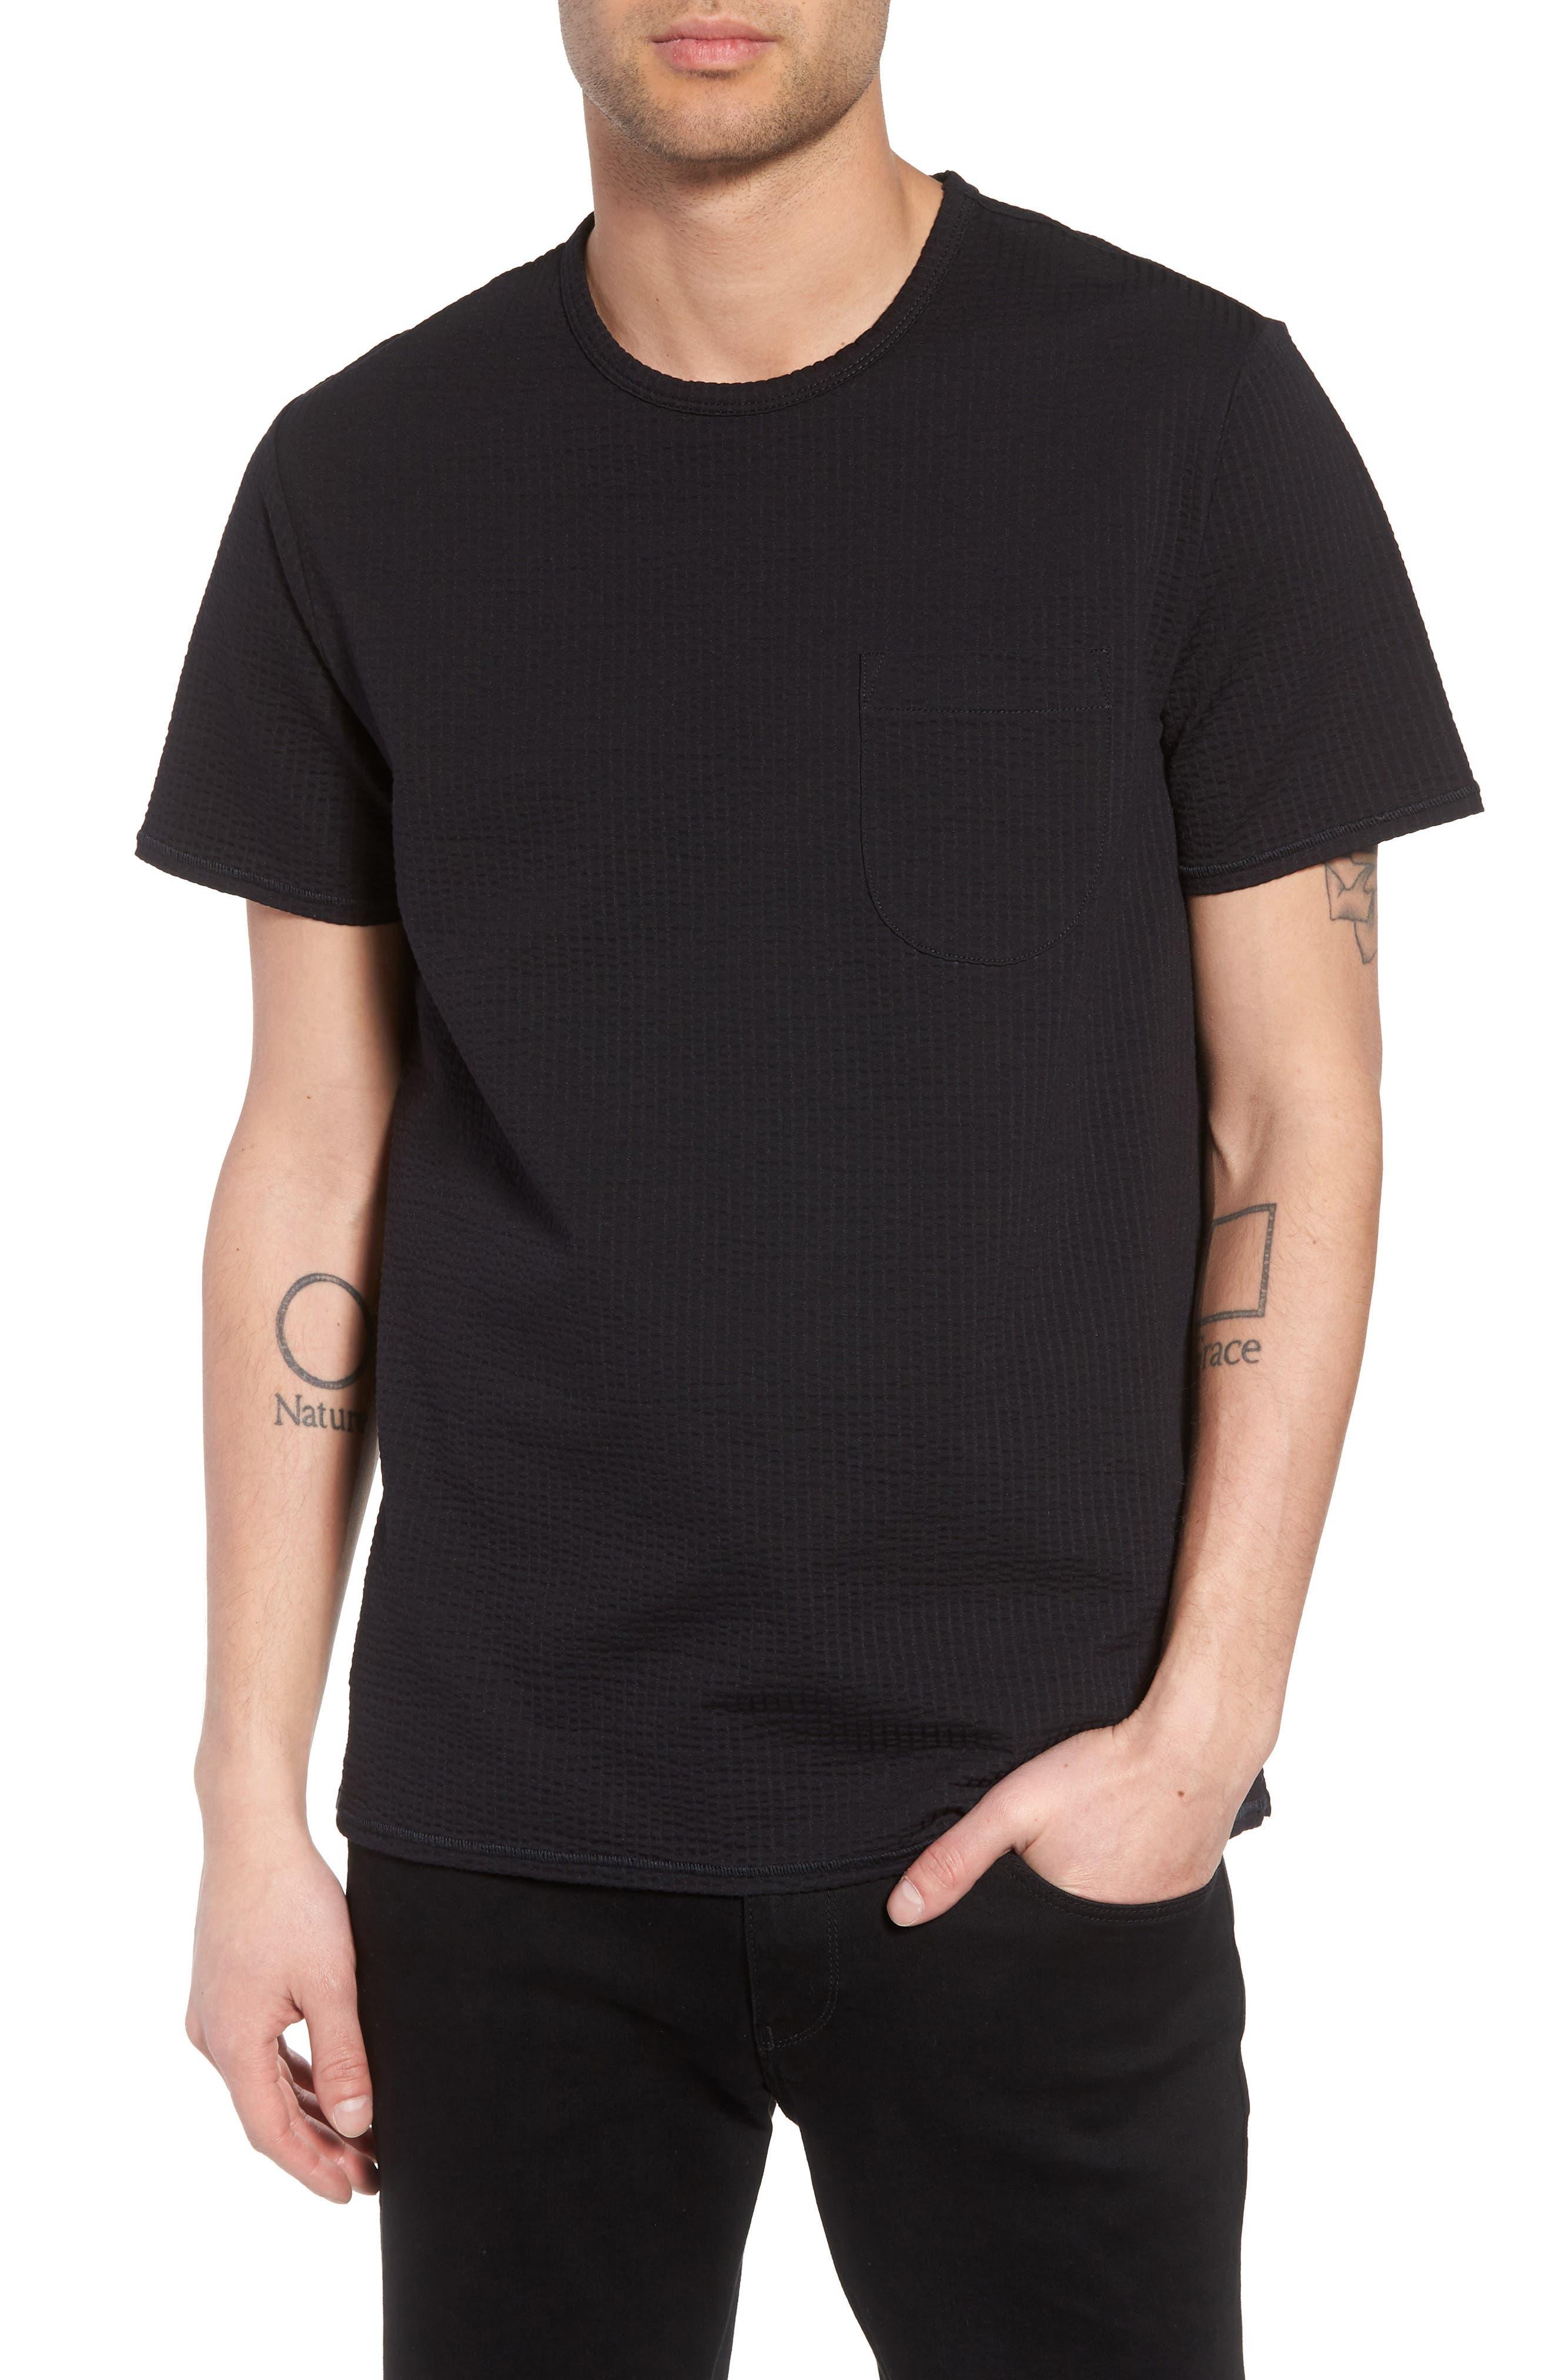 Japanese Seersucker T-Shirt,                             Main thumbnail 1, color,                             Black Seersucker